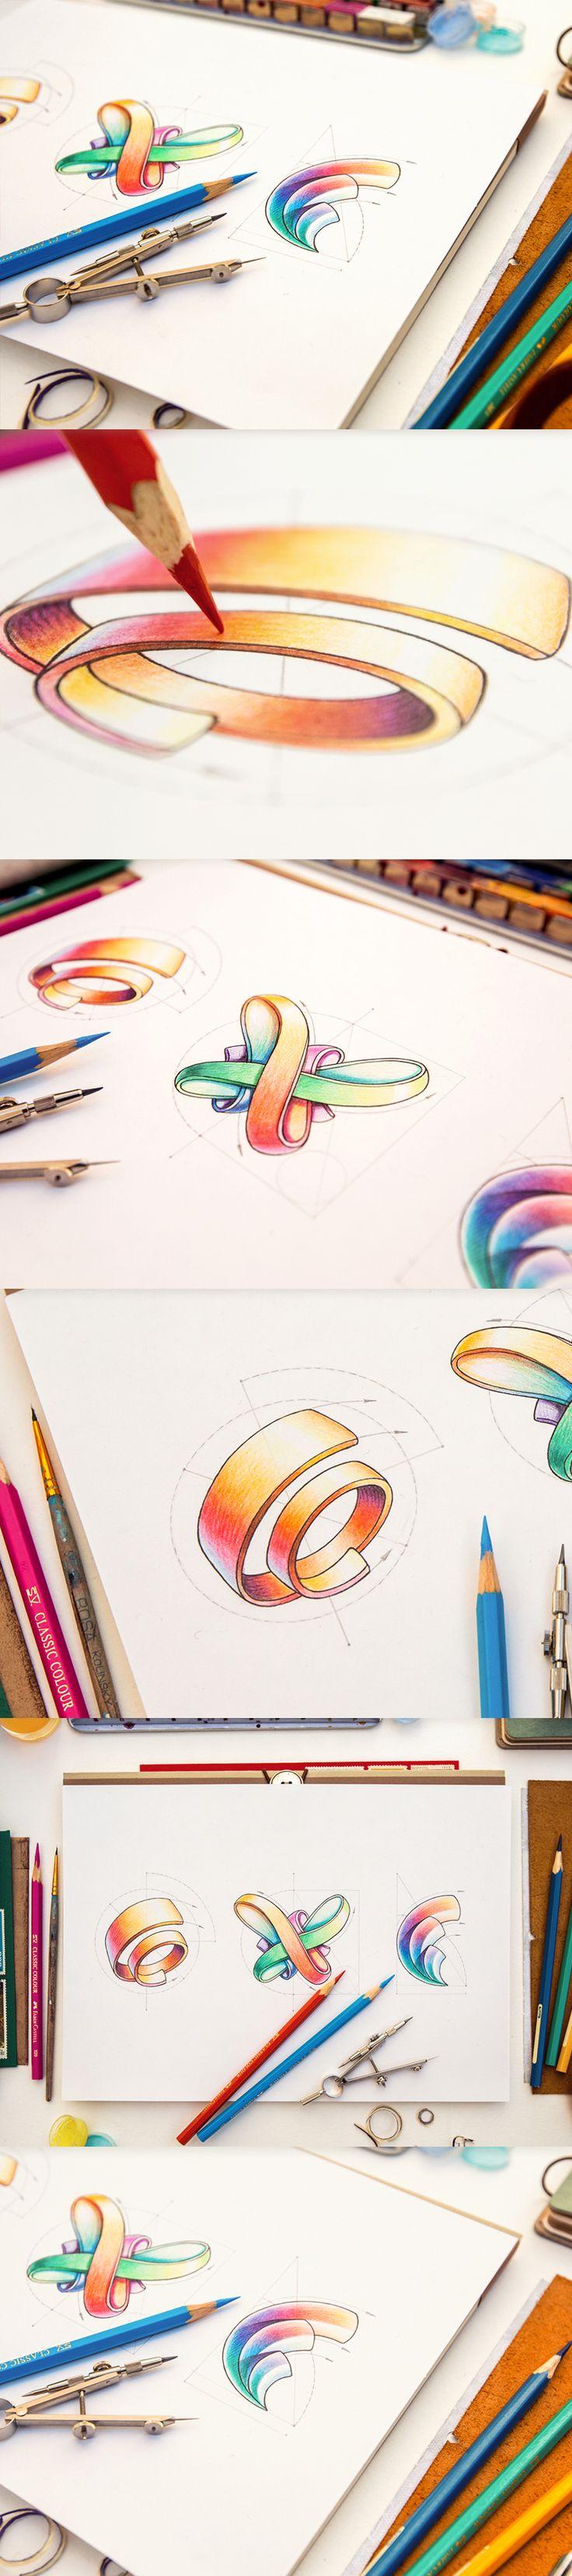 manystufforg  Art amp Design  Graphic Design